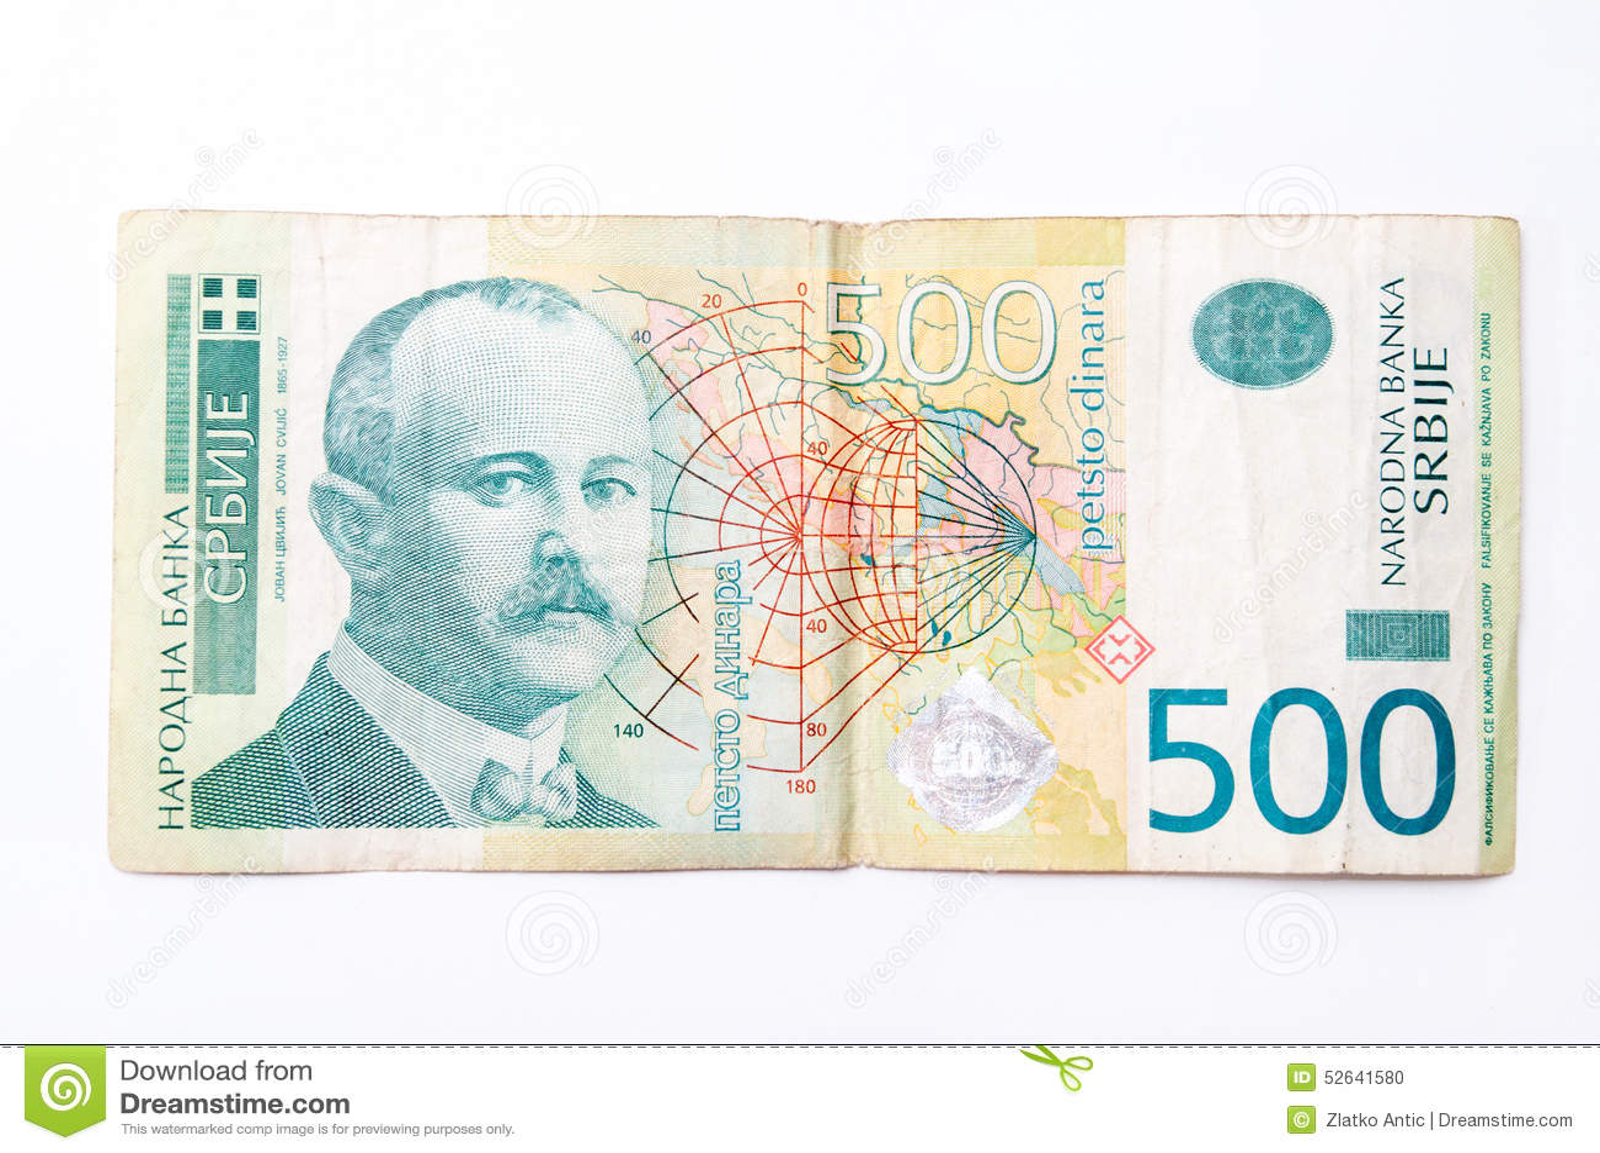 Banknote of five hundred Serbian dinars